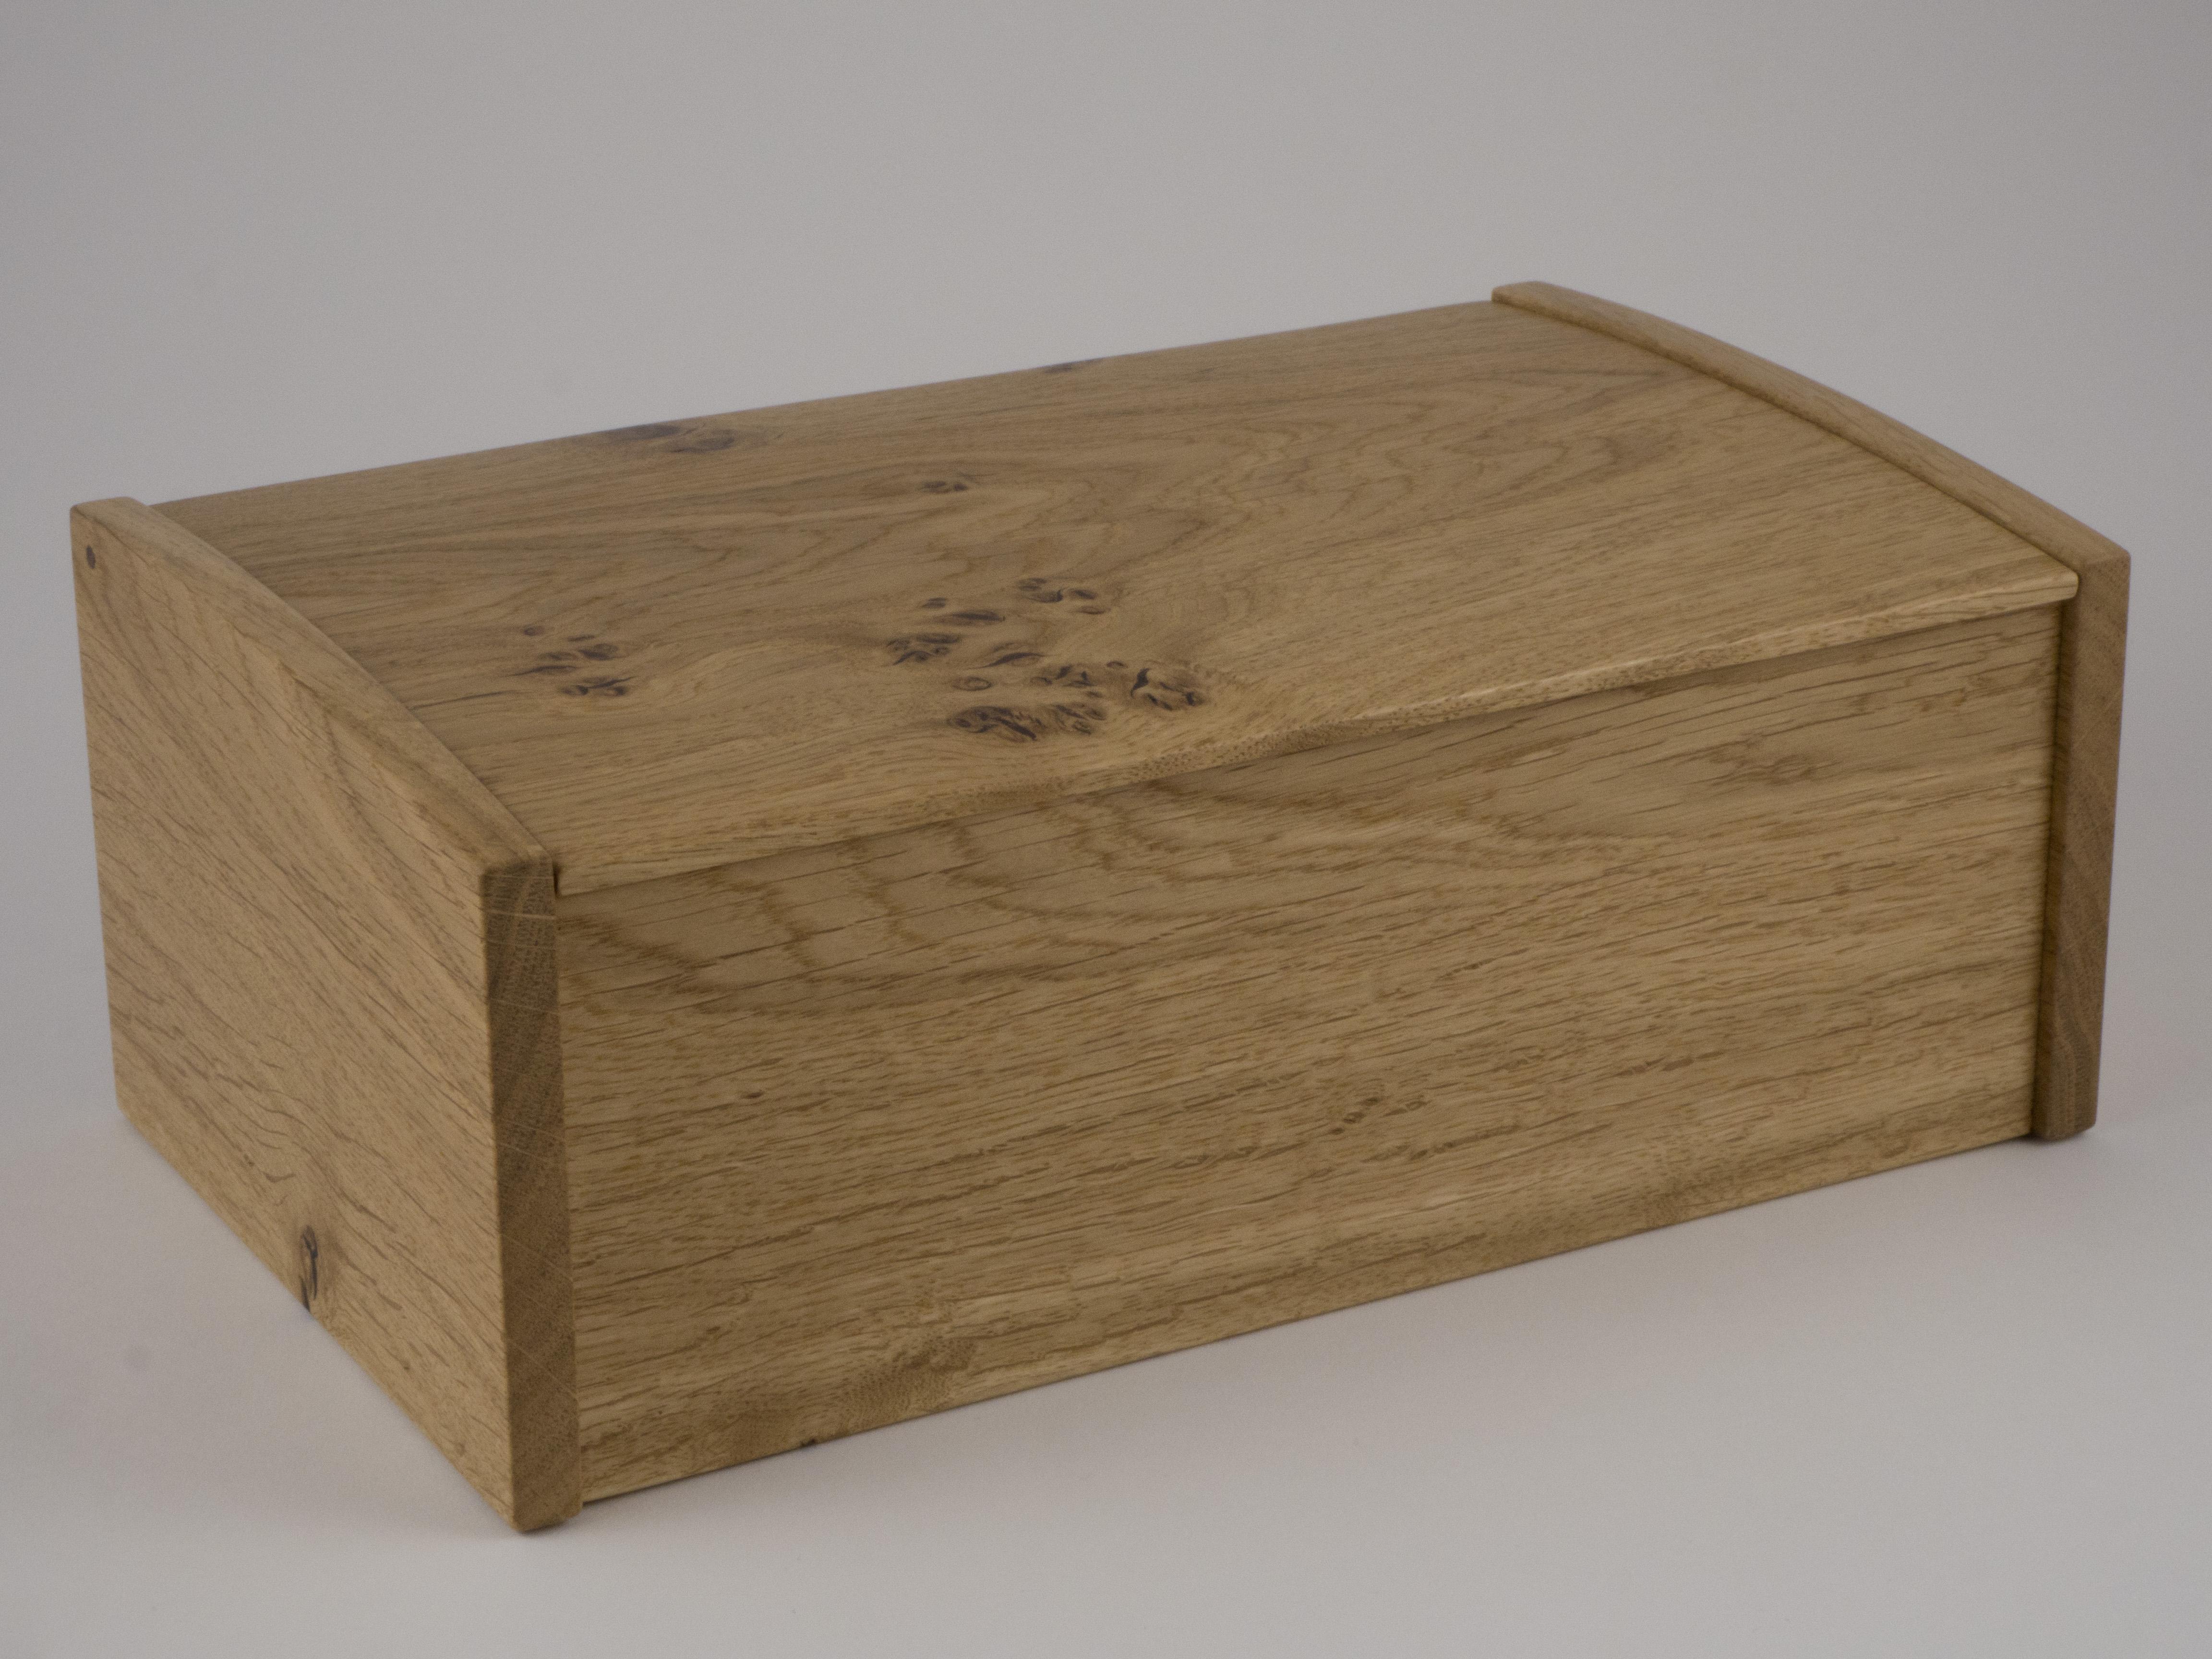 Jewellery box made from English oak